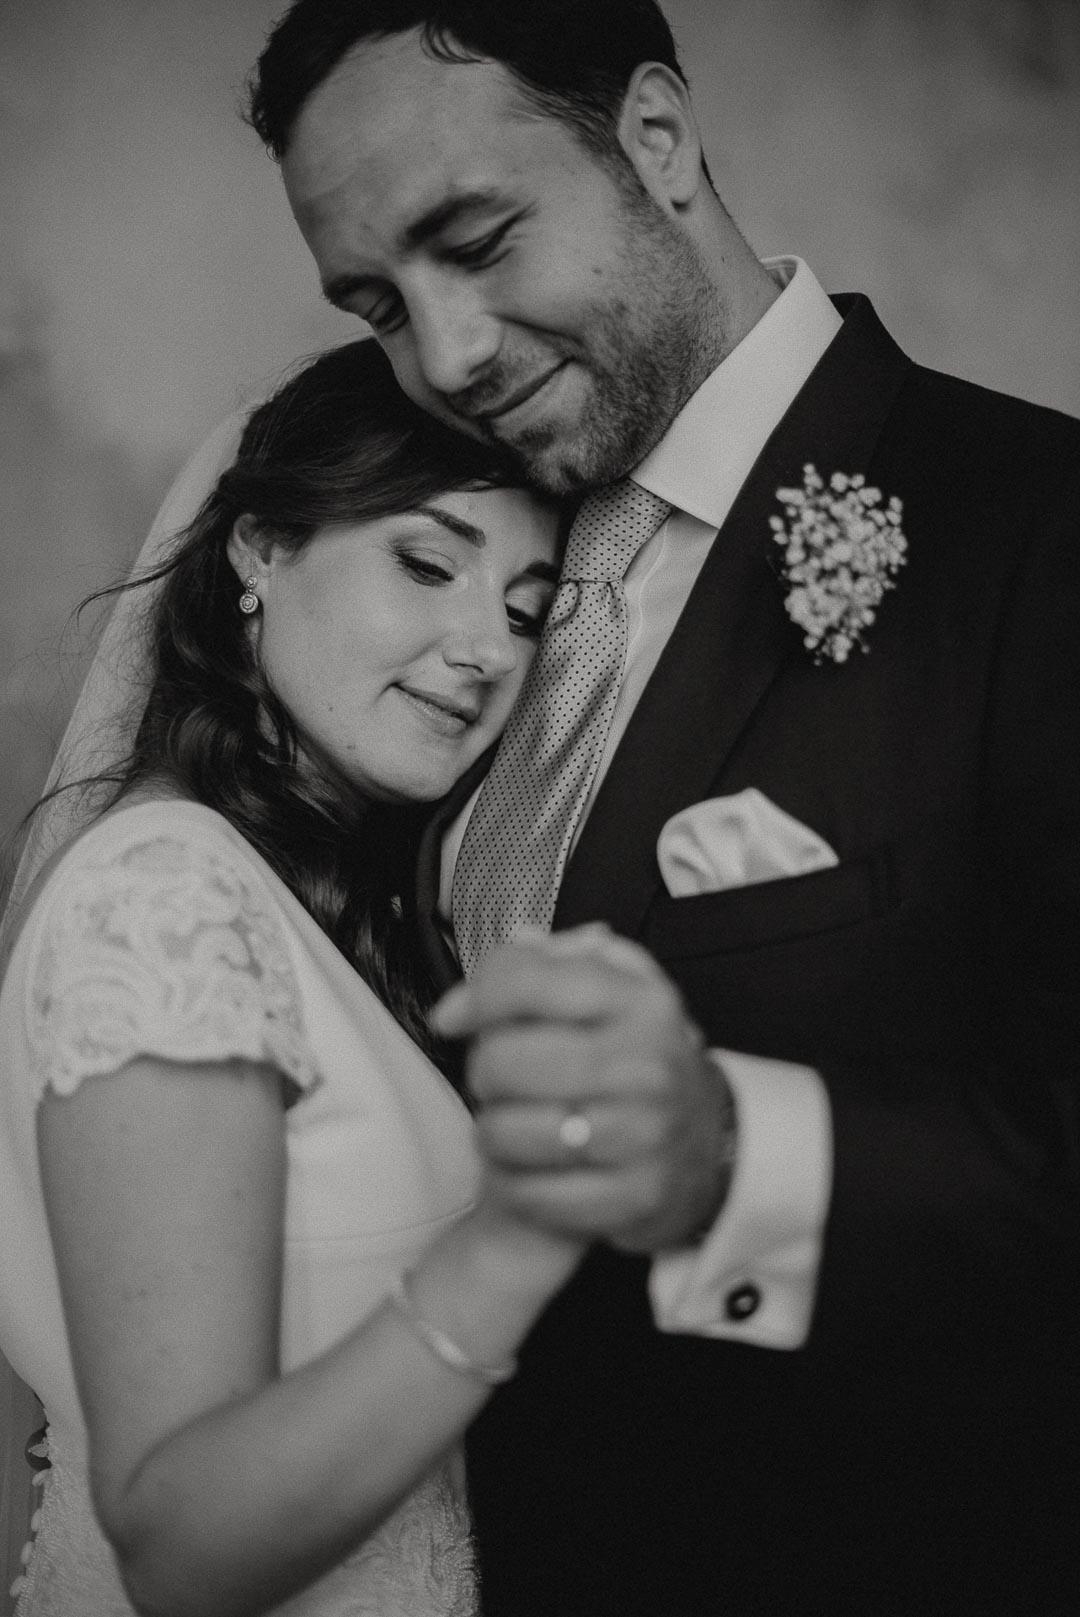 wedding-photographer-destination-fineart-bespoke-reportage-sorrento-parcodeiprincipi-vivianeizzo-spazio46-59